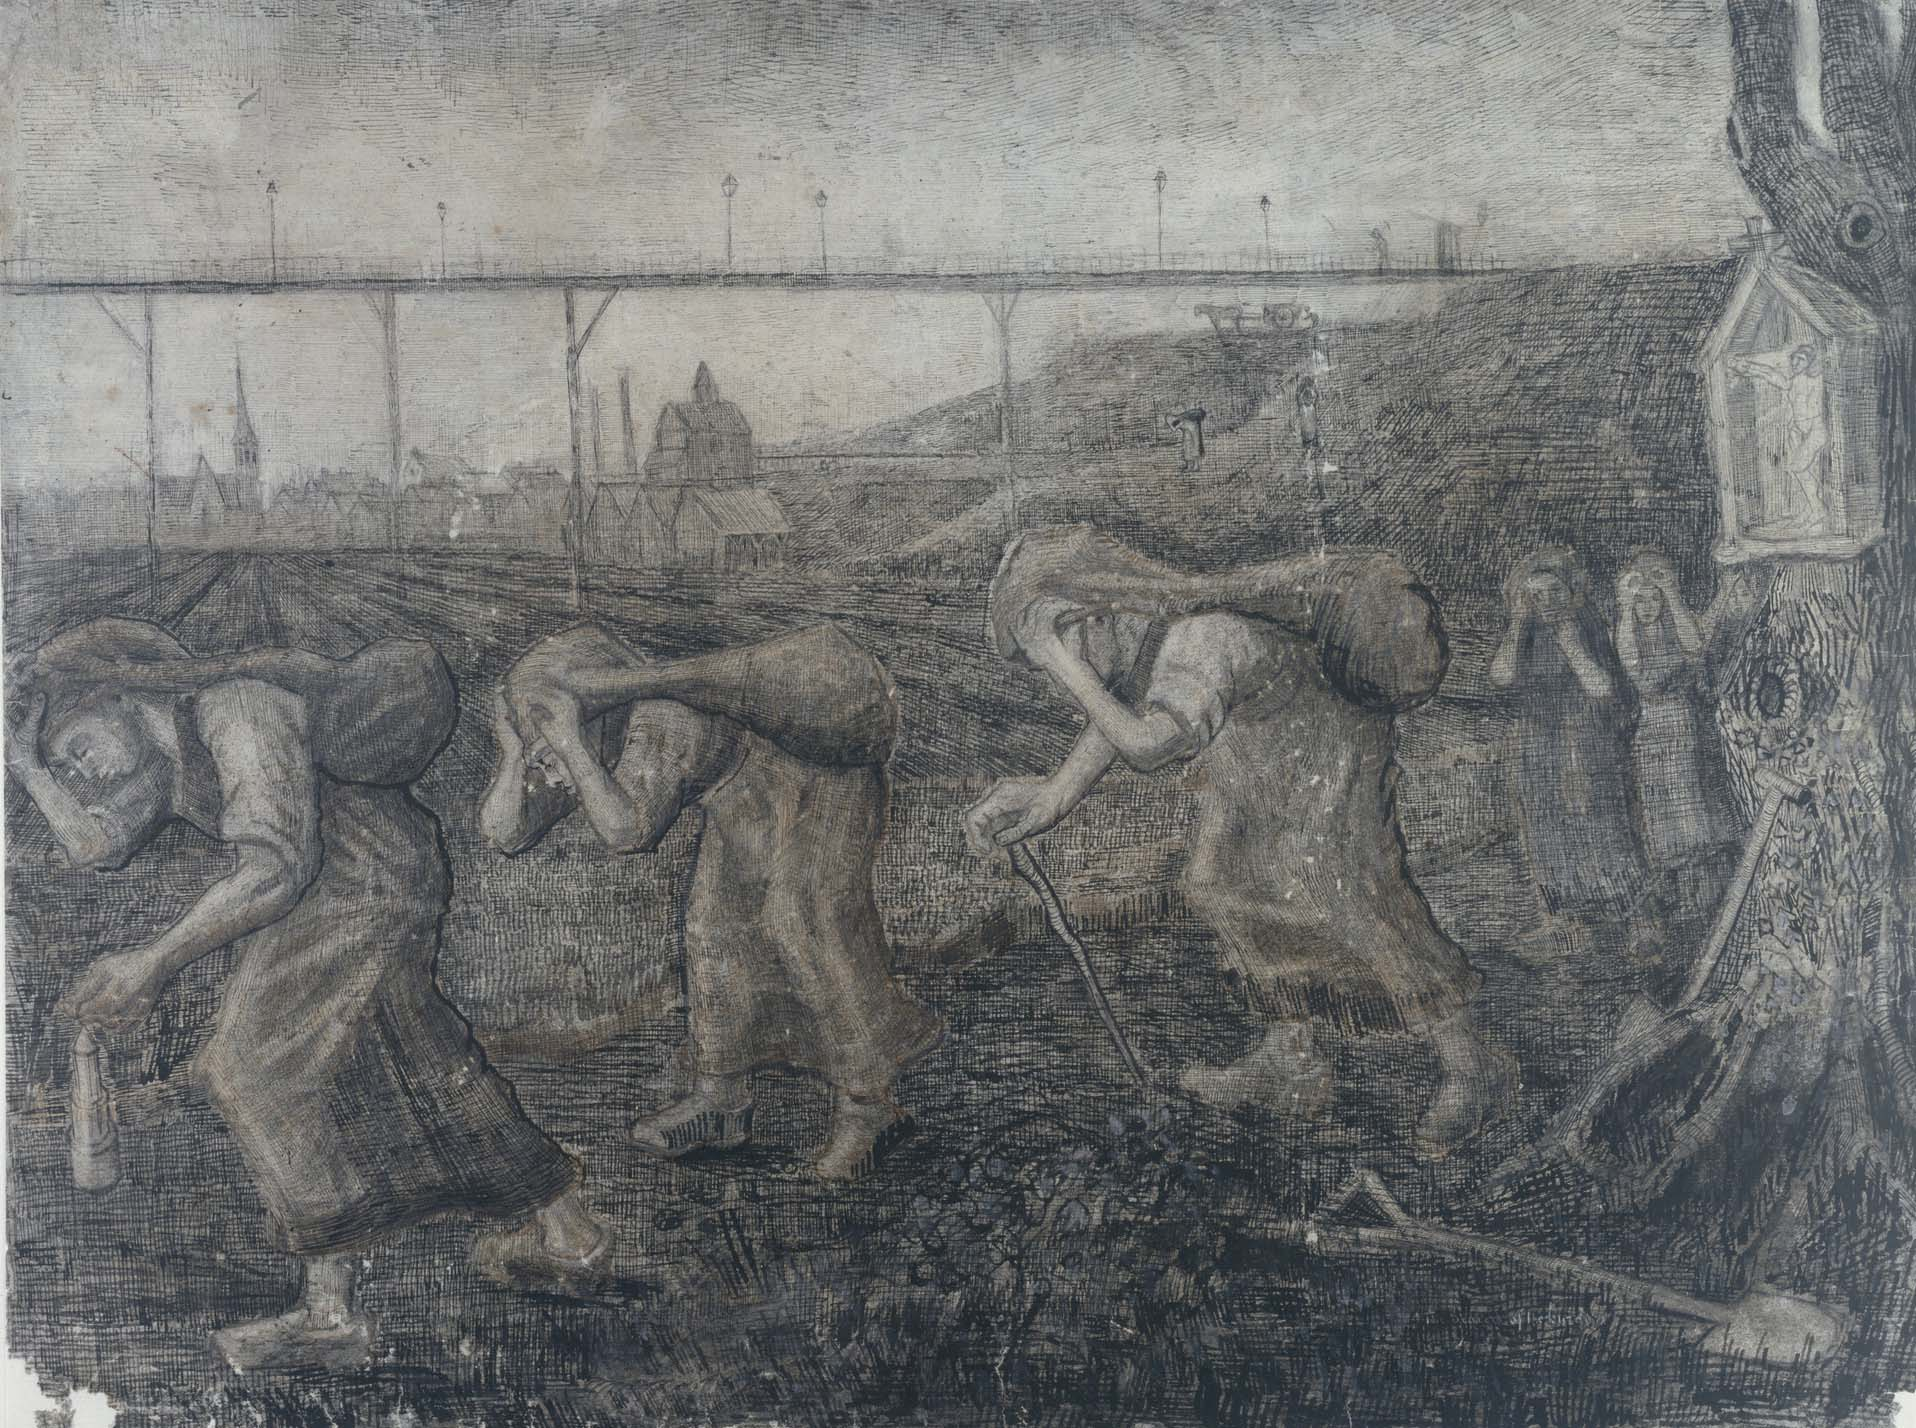 Mijnwerkersvrouwen zakkend dragend -Van Gogh_ coll. Kroller Muller